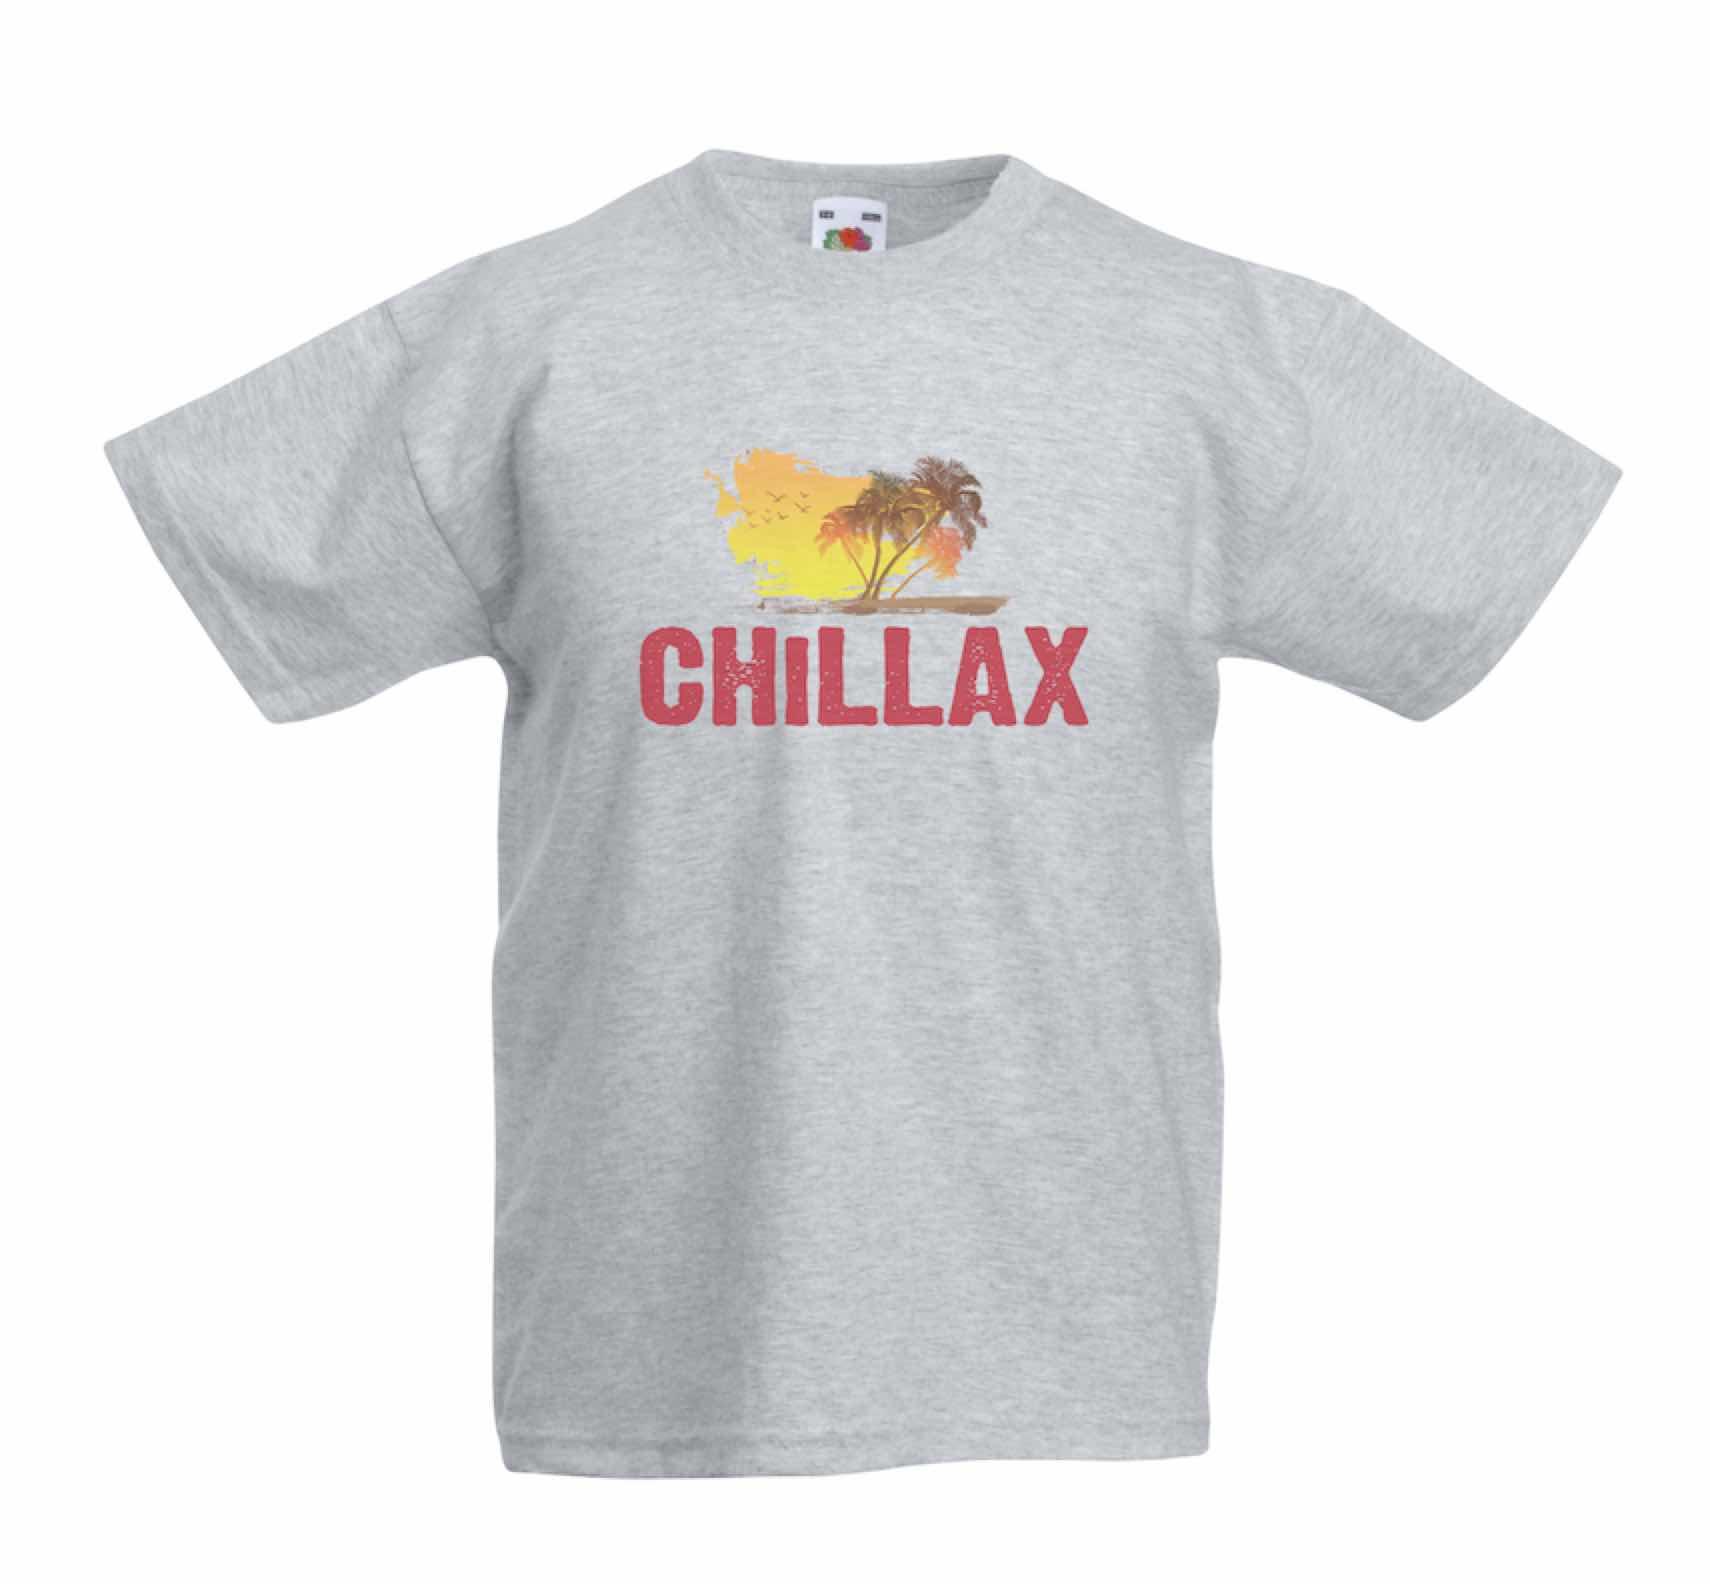 Chillax design for t-shirt, hoodie & sweatshirt